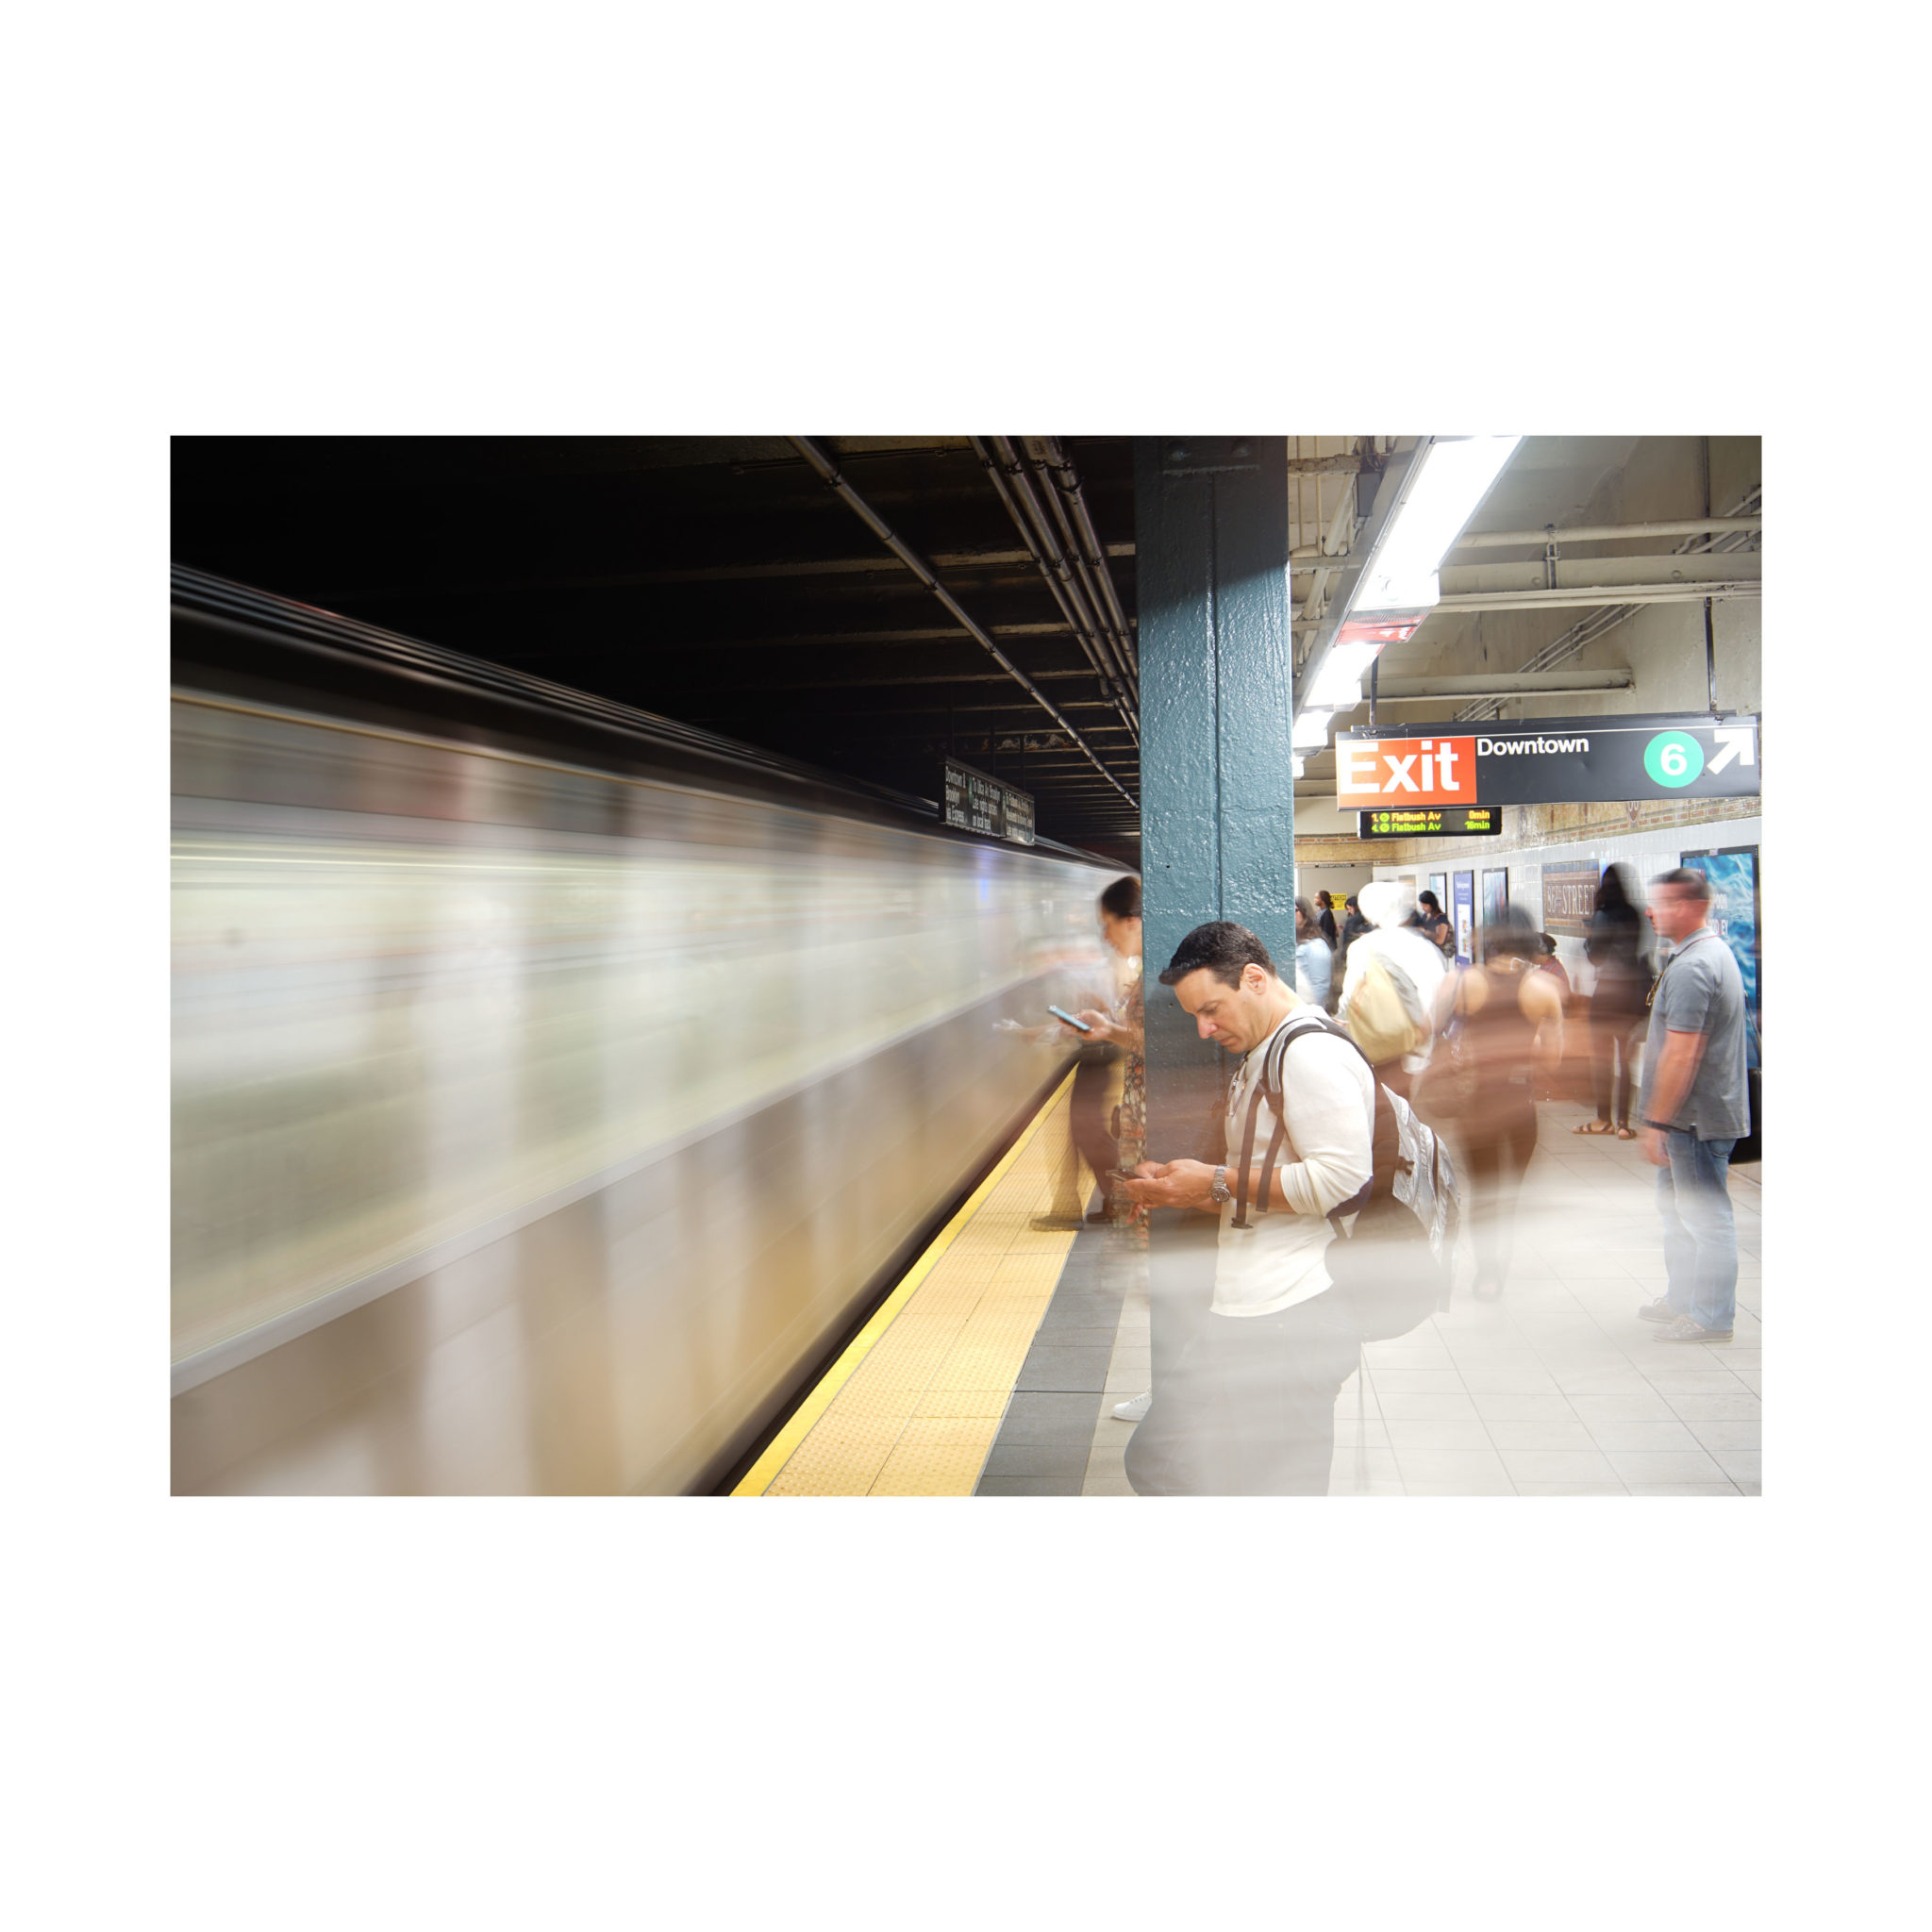 NYC Sub (long pose)